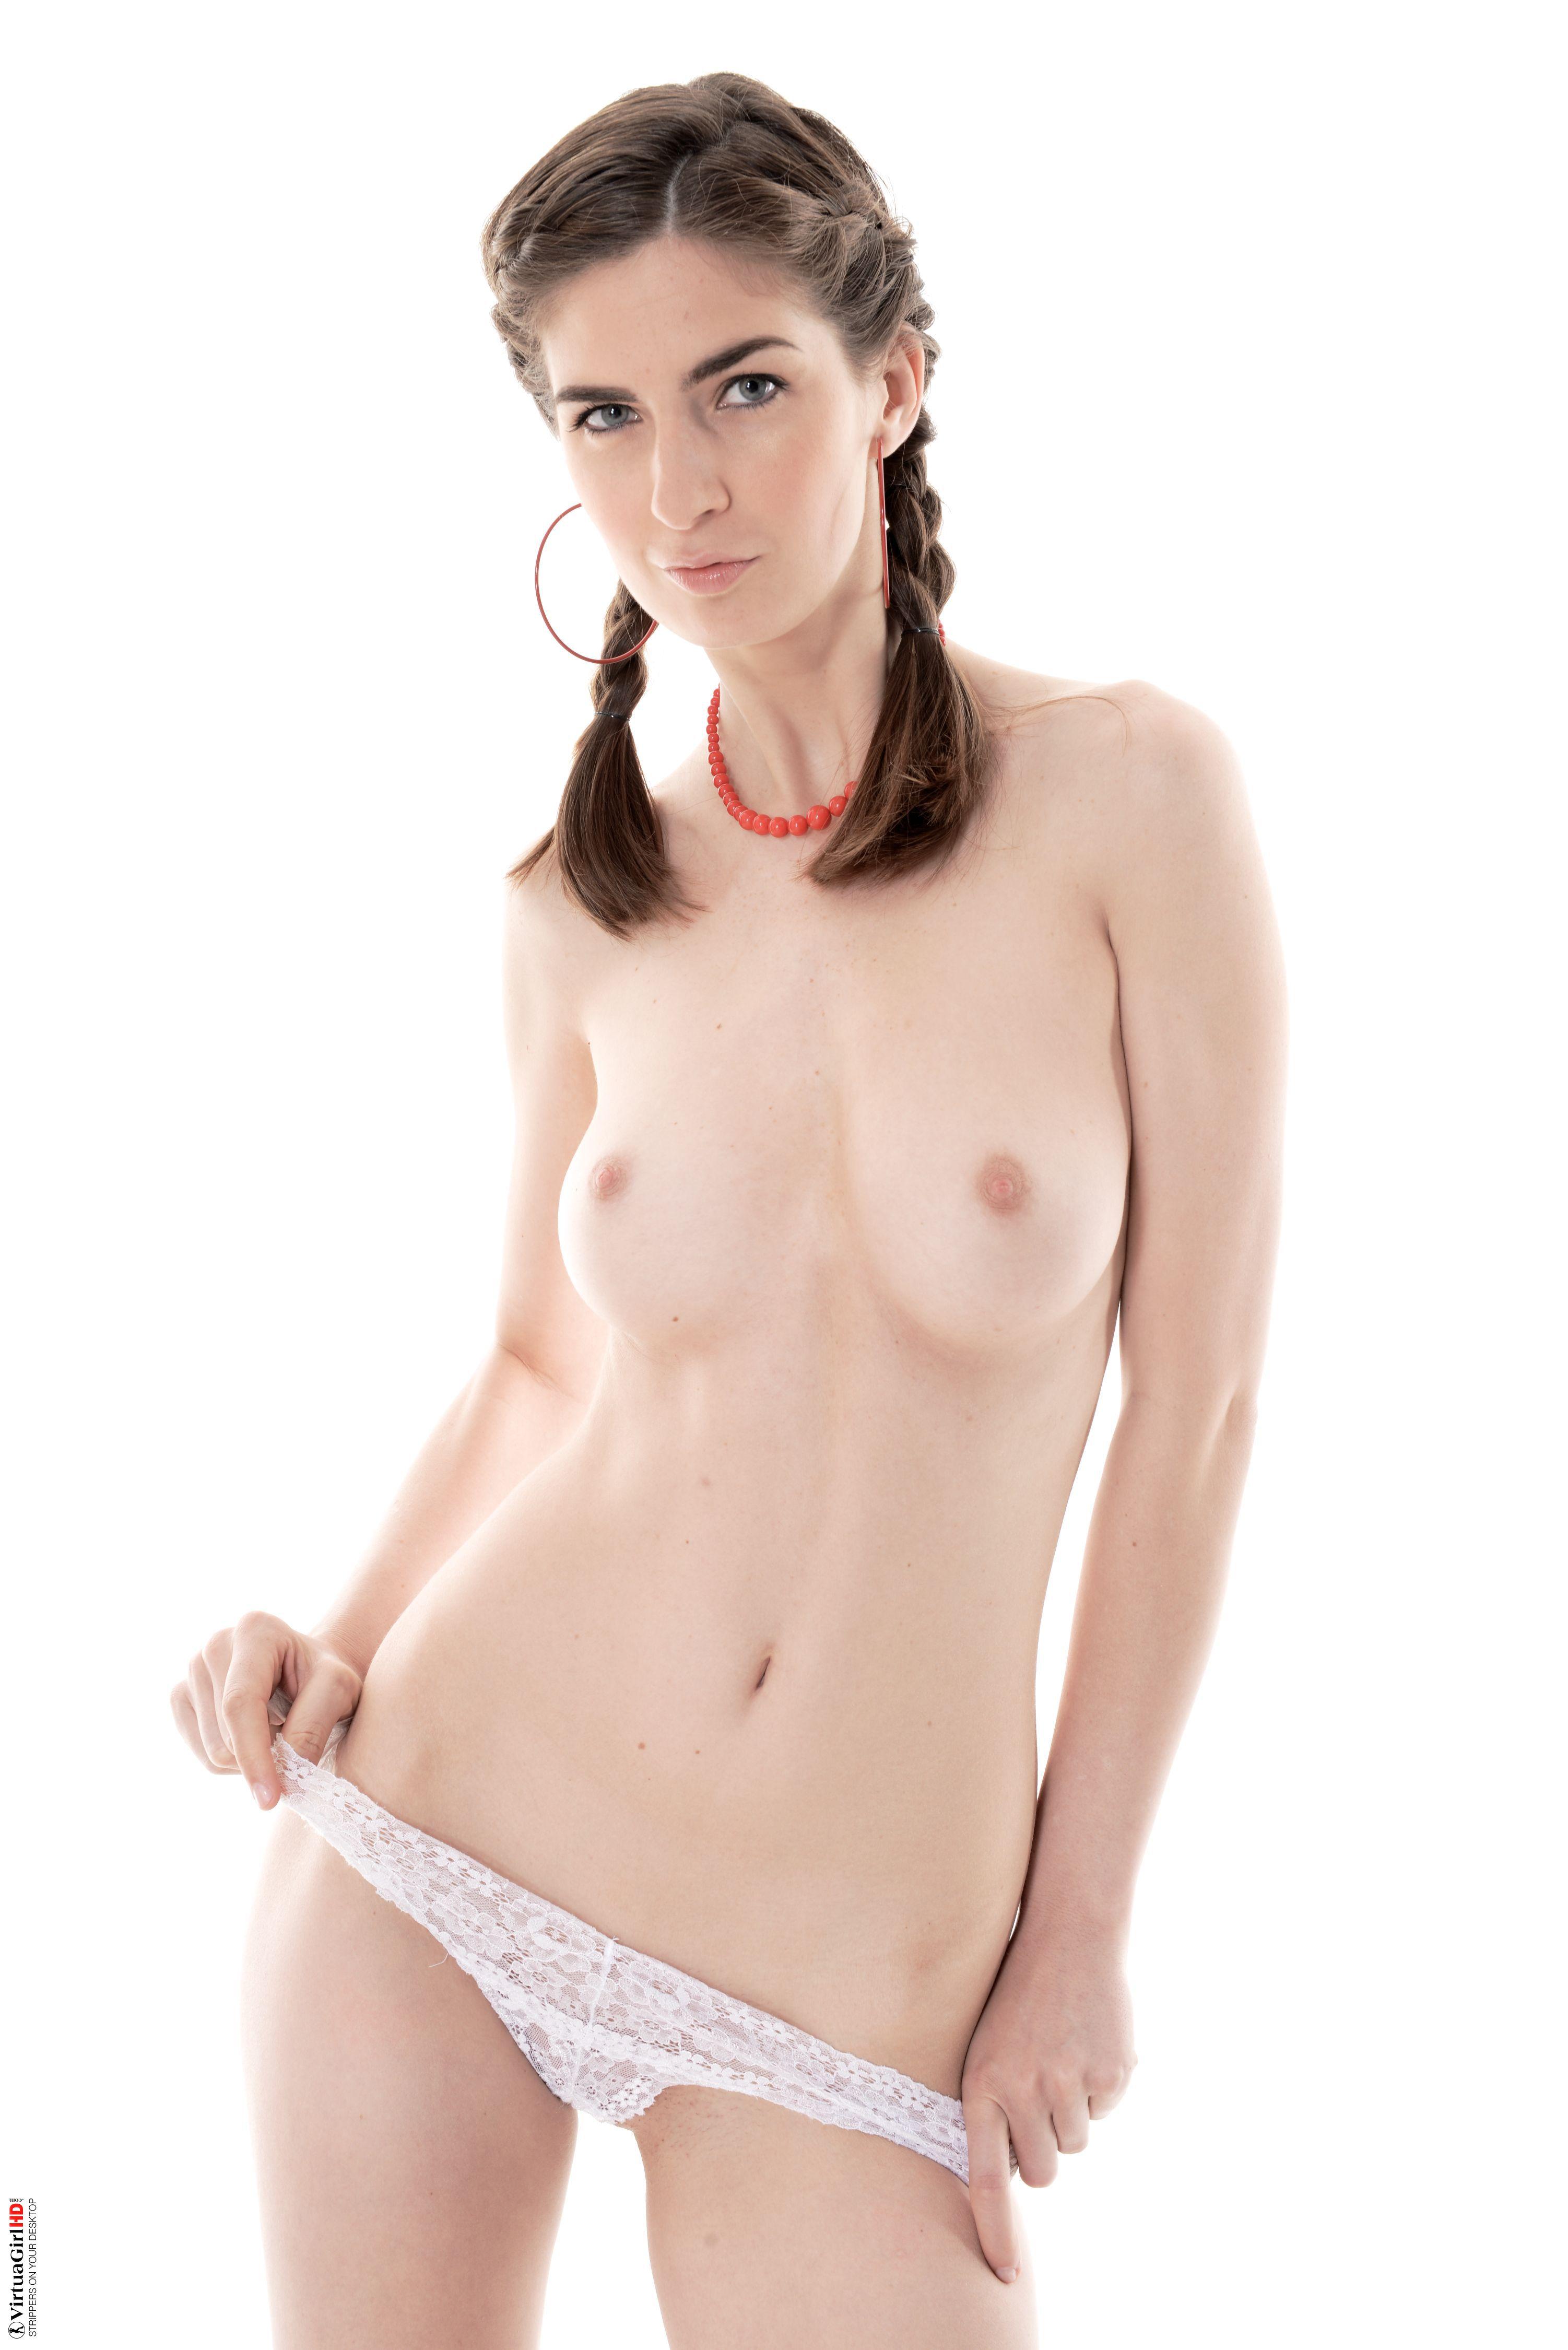 girls stripping and having sex on girls